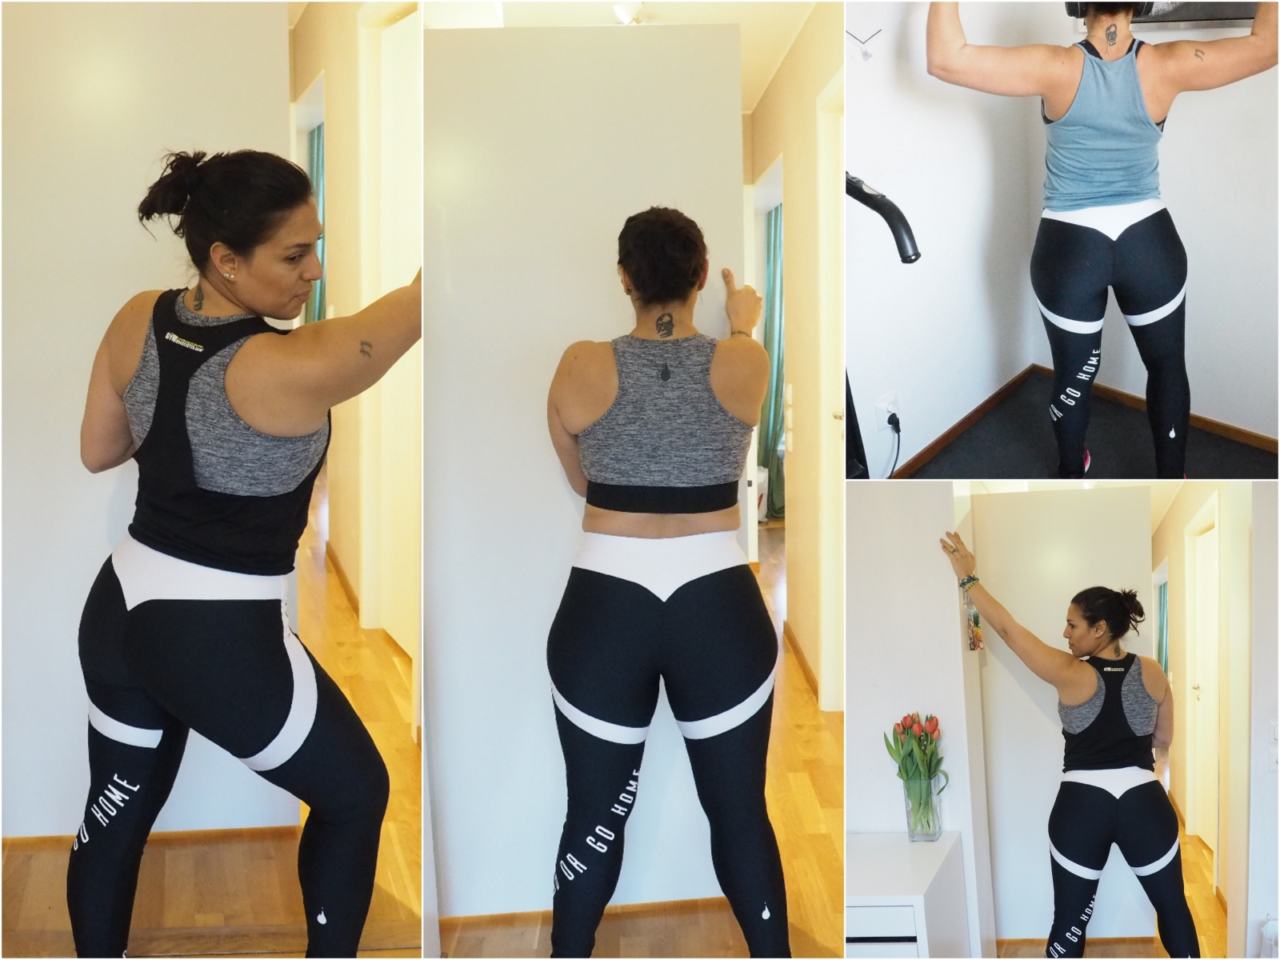 fitnessmotivation-viktnedgang-fett-snygg-girl